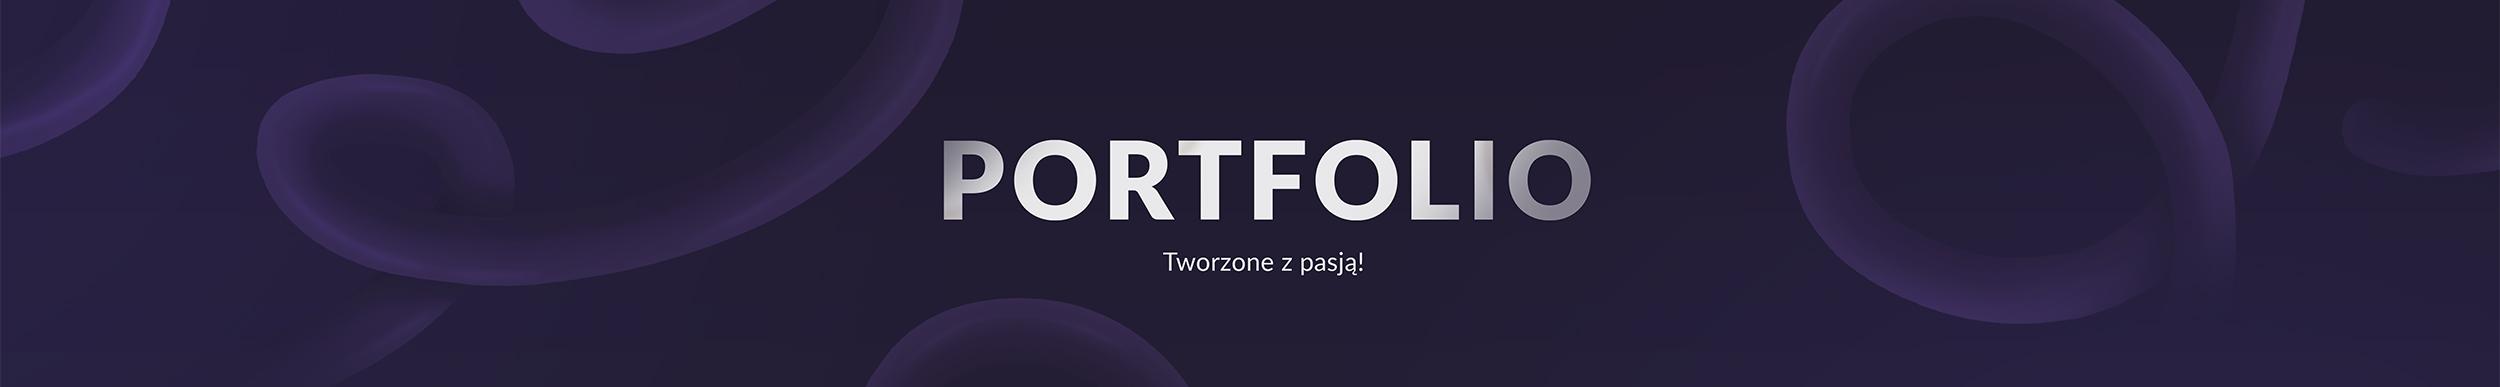 Artsome Studio portfolio